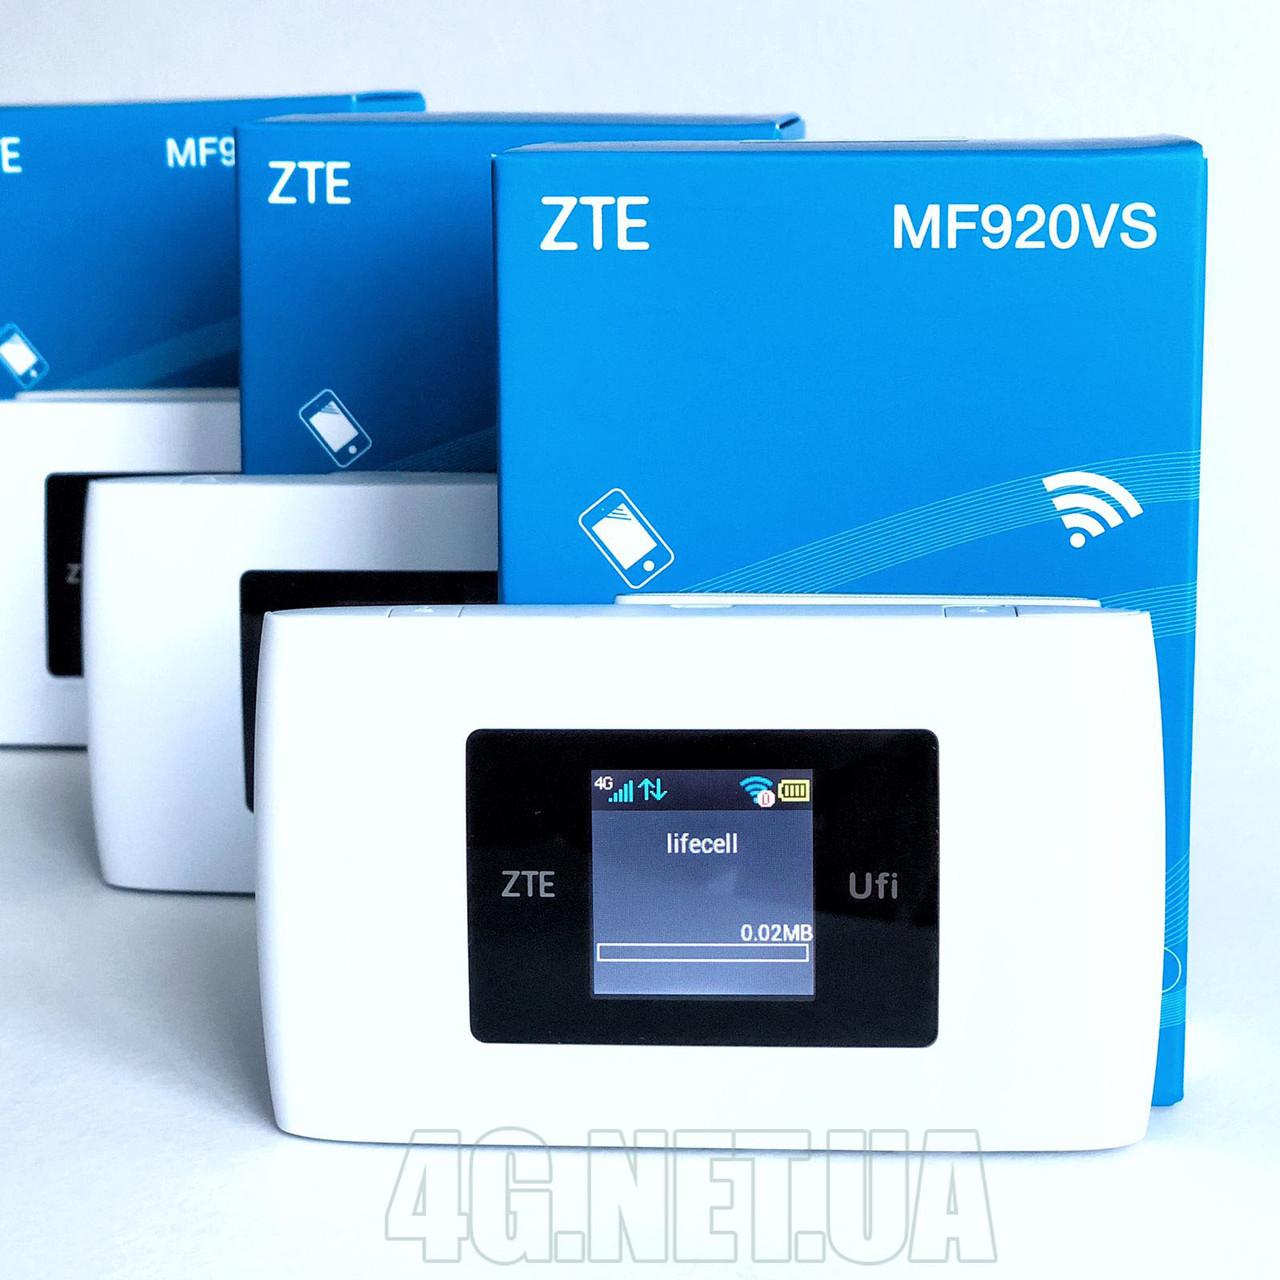 4G/3G wifi роутер ZTE MF920VS под симкарту Lifecell, Киевстар, Vodafone